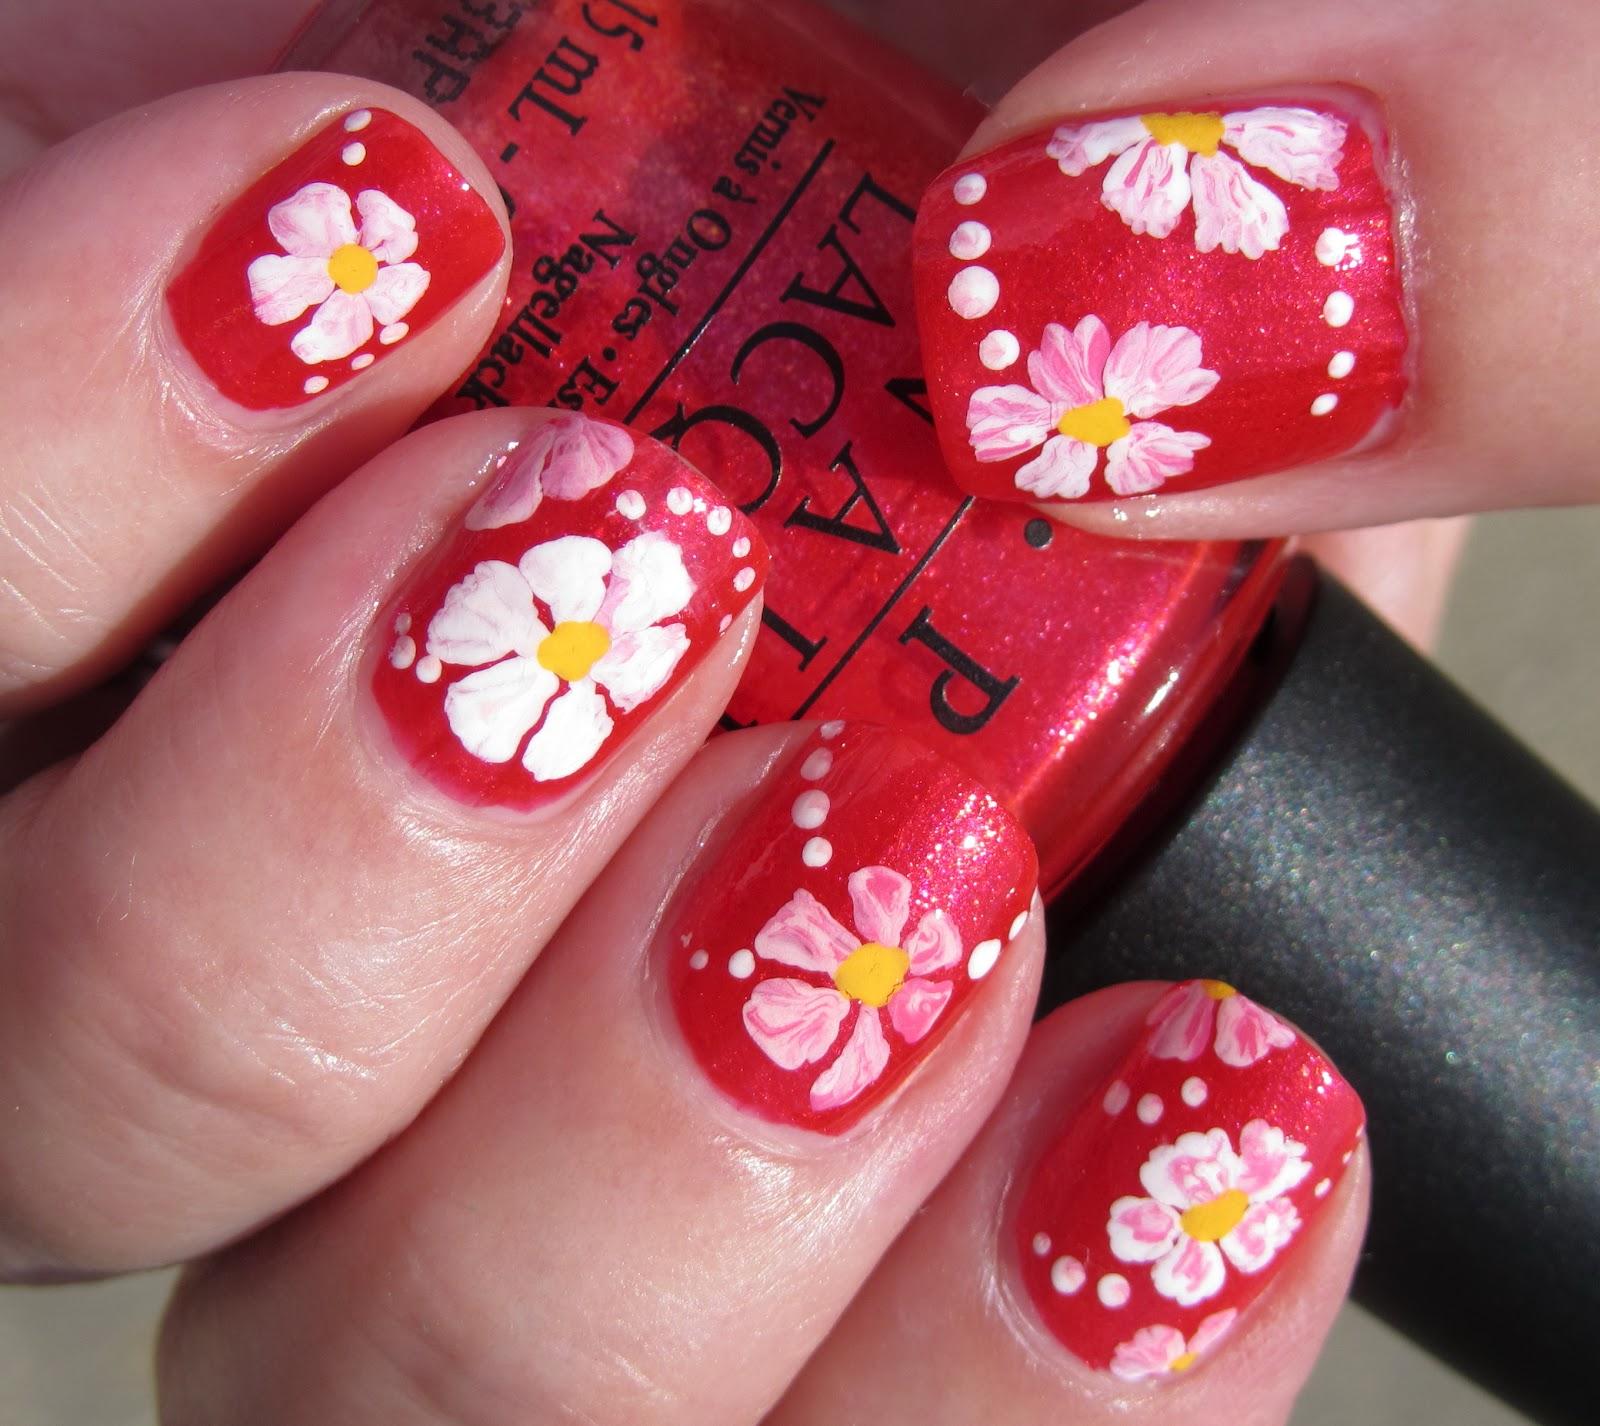 Marias Nail Art and Polish Blog: Matching mani - pedi...